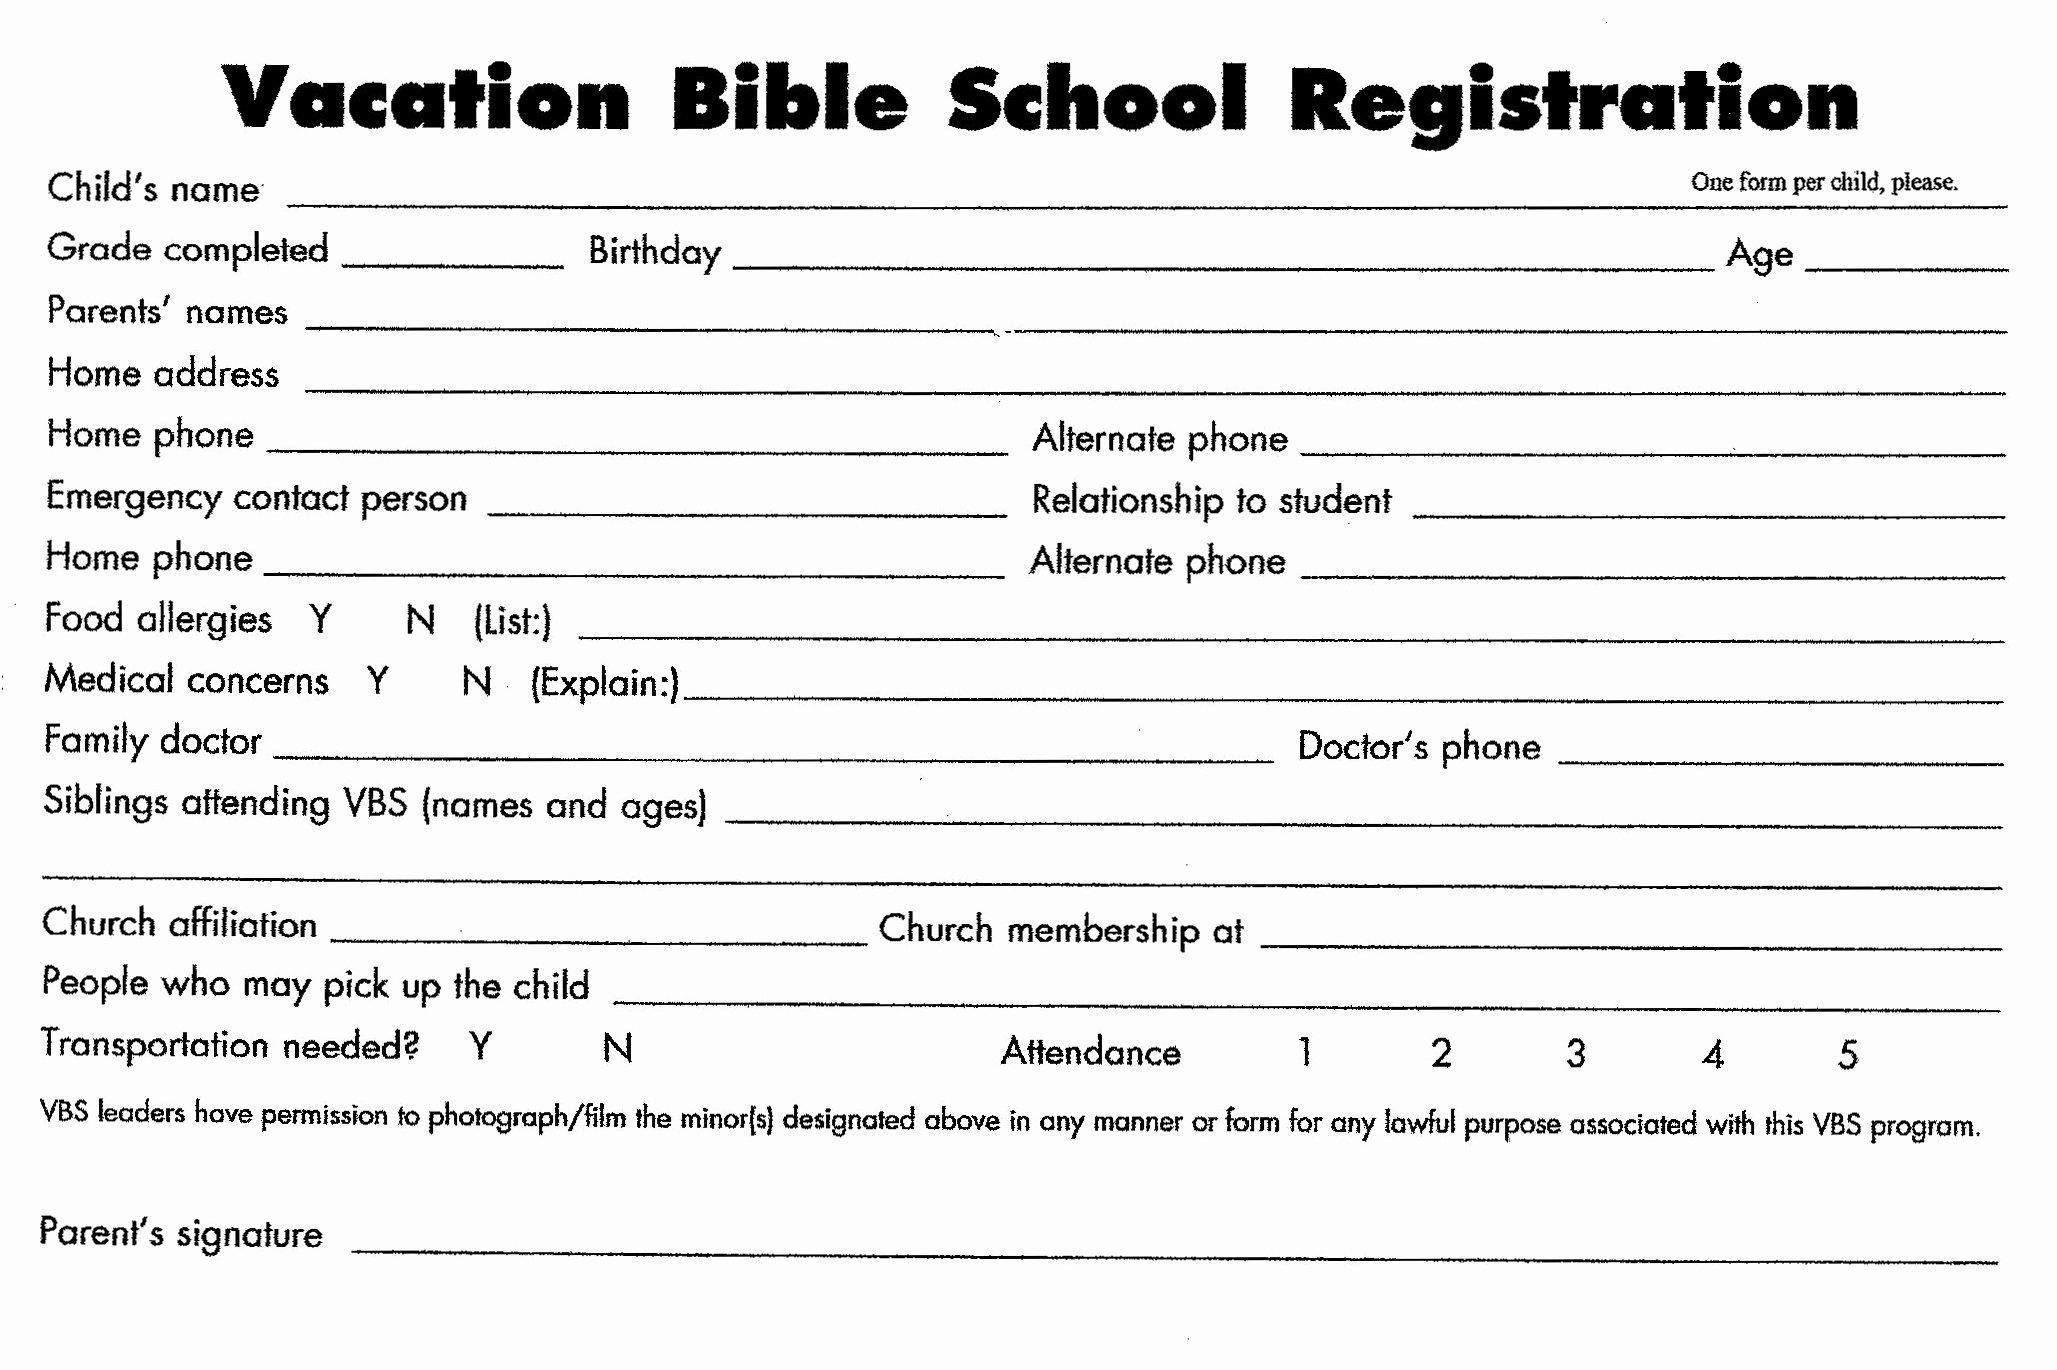 School Registration form Template Unique Index Of Cdn 24 1990 765